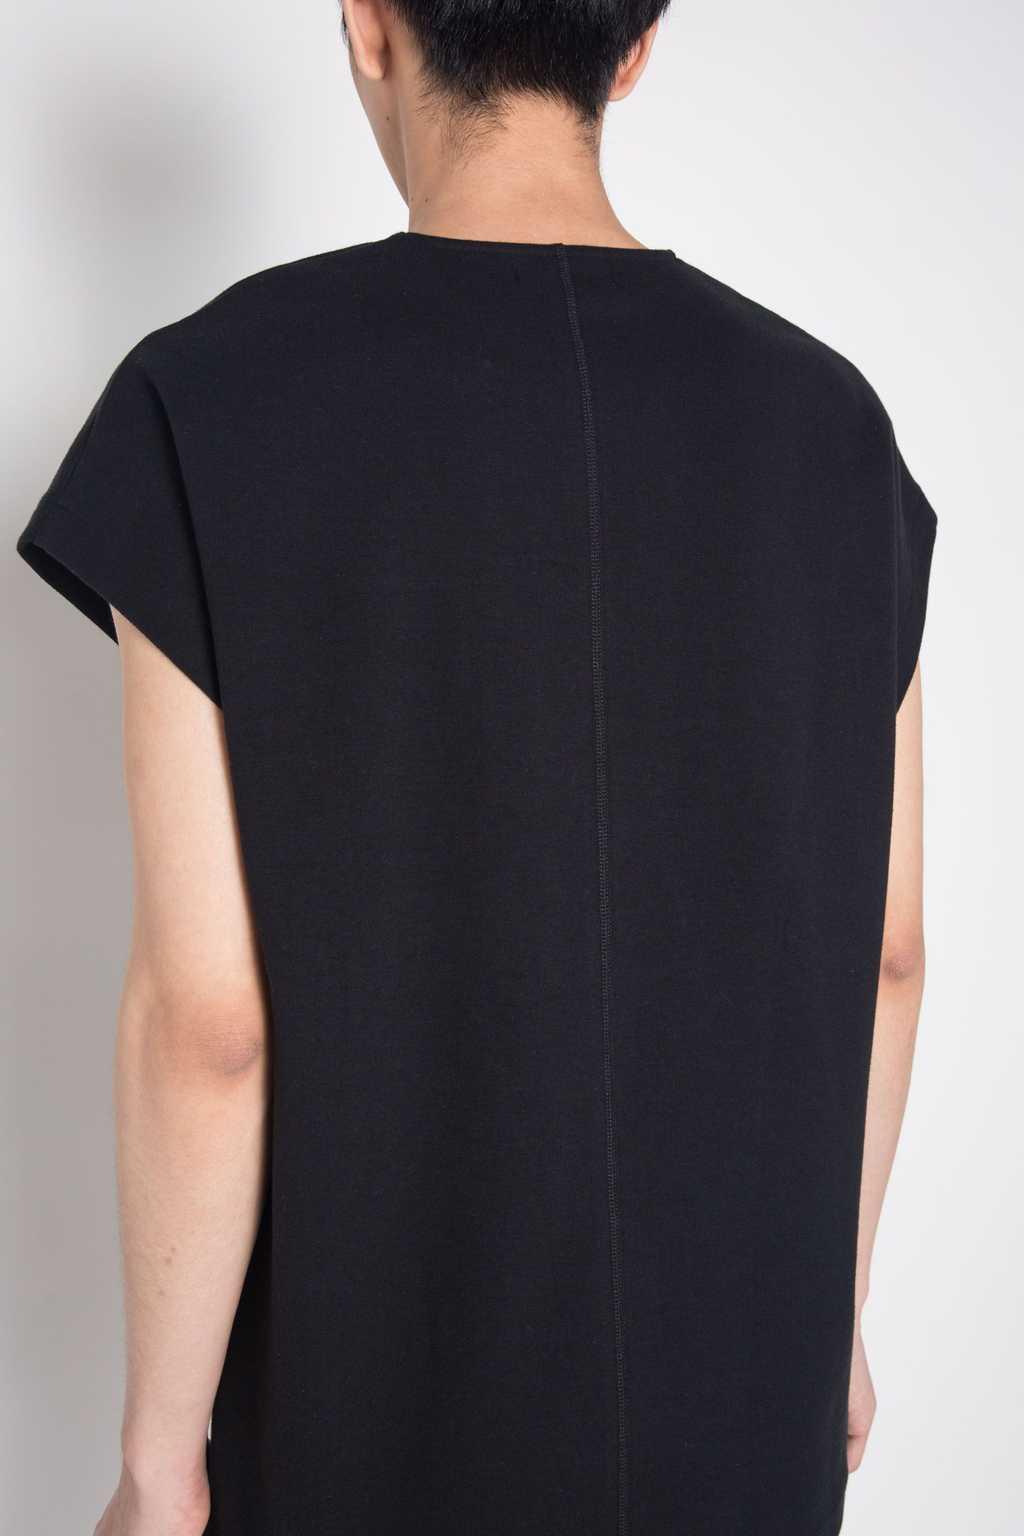 Sweatshirt 1229 Black 2